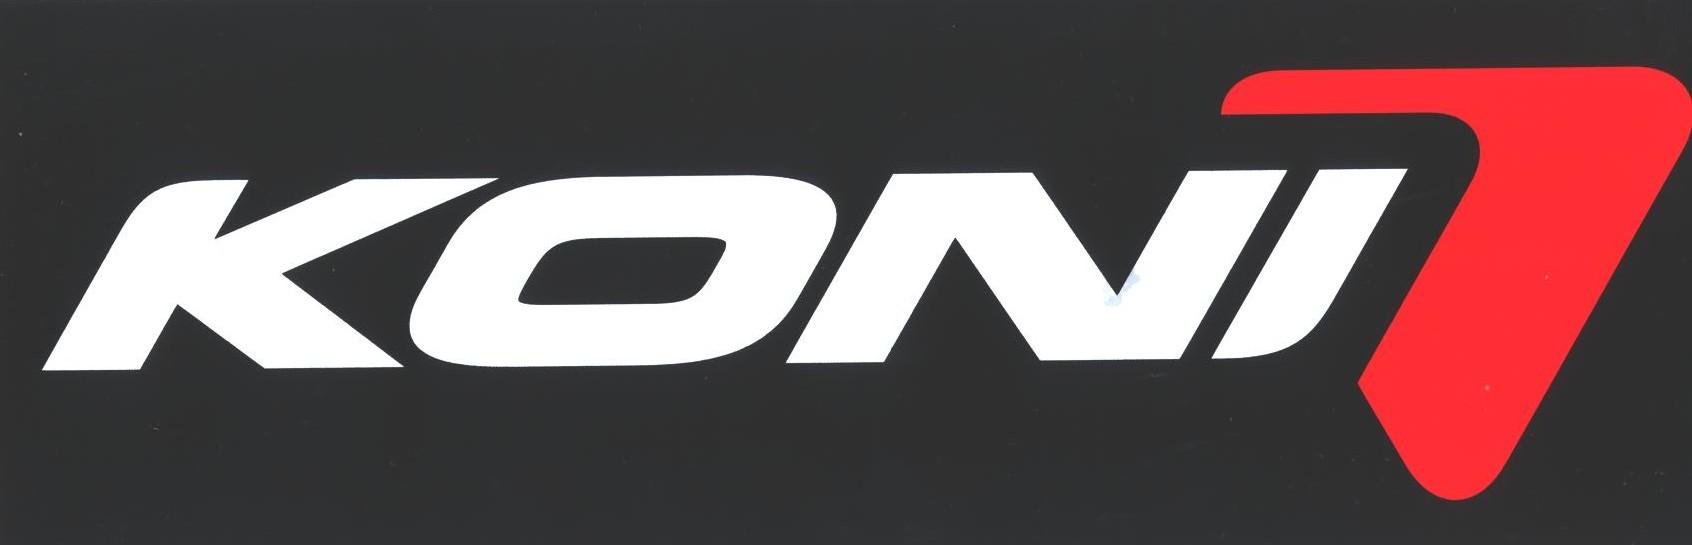 Koni new logo.jpg